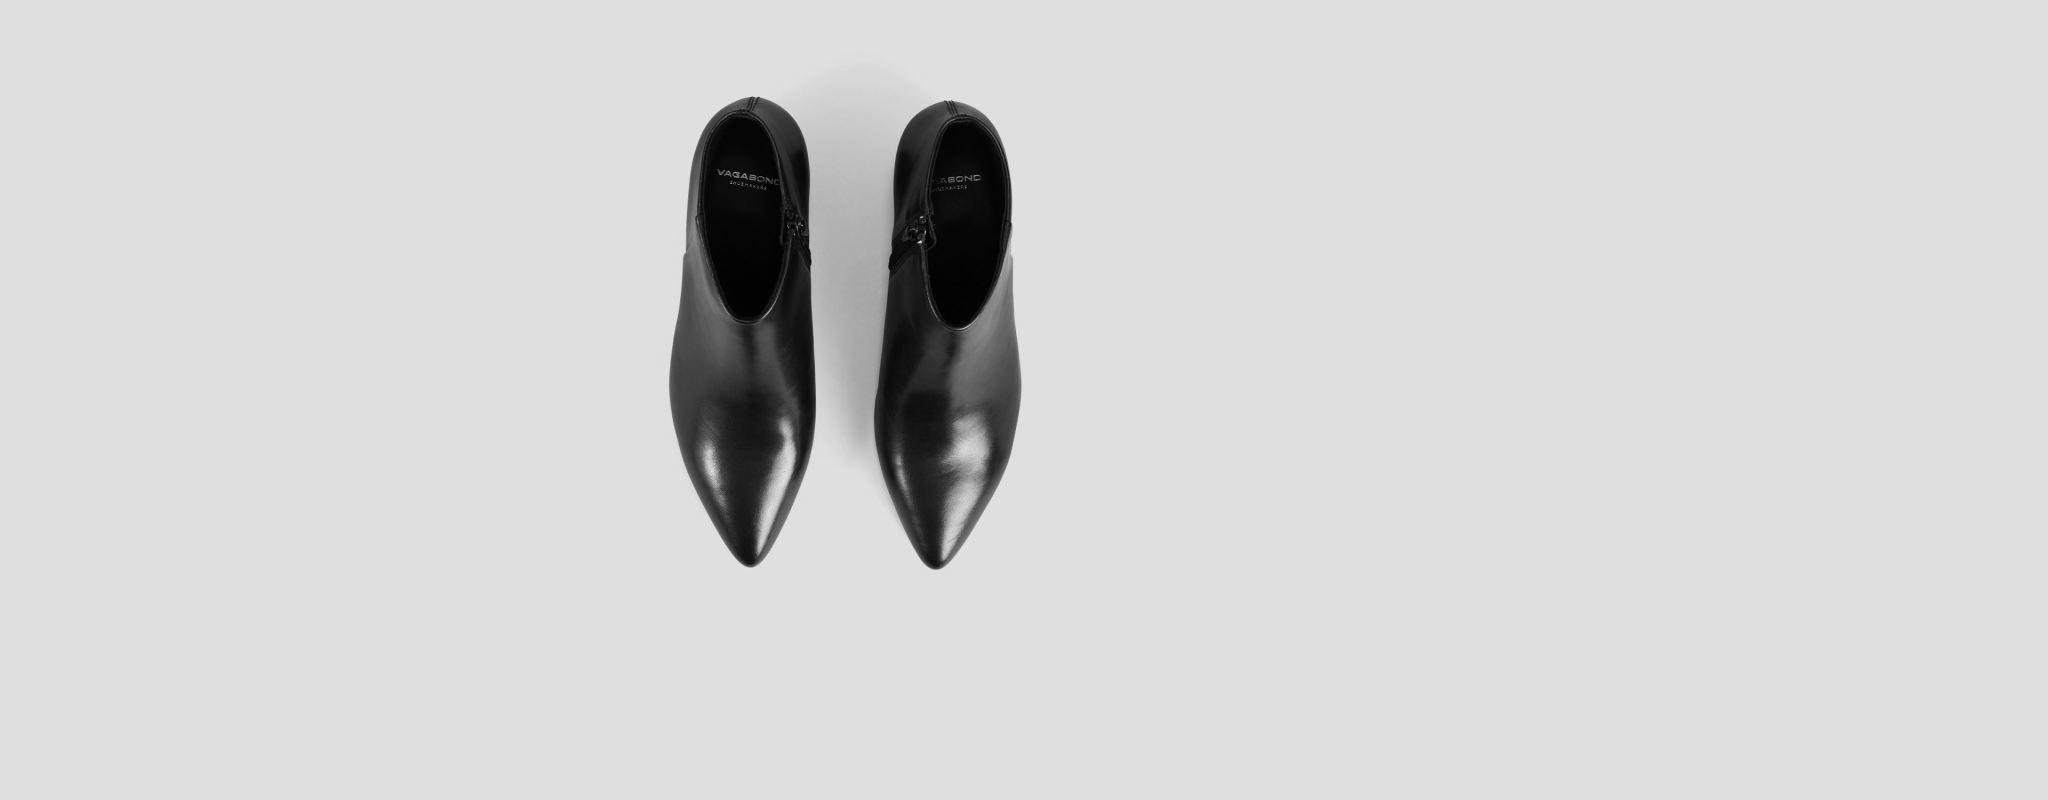 Mya Half High Black Leather Boots-2